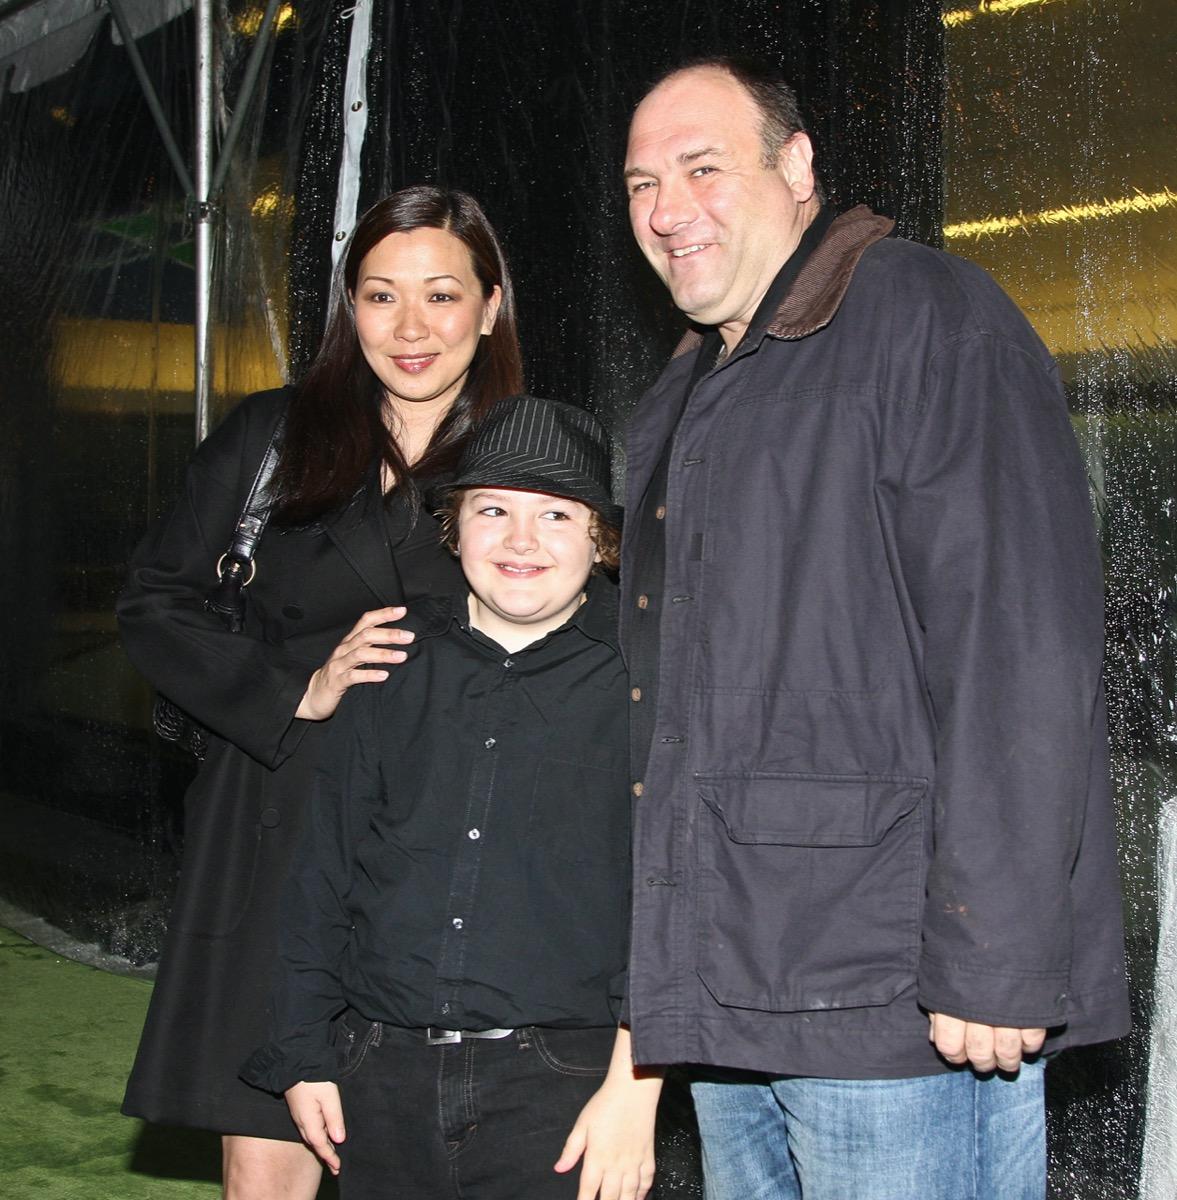 James Gandolfini with wife Deborah Lin and son Michael